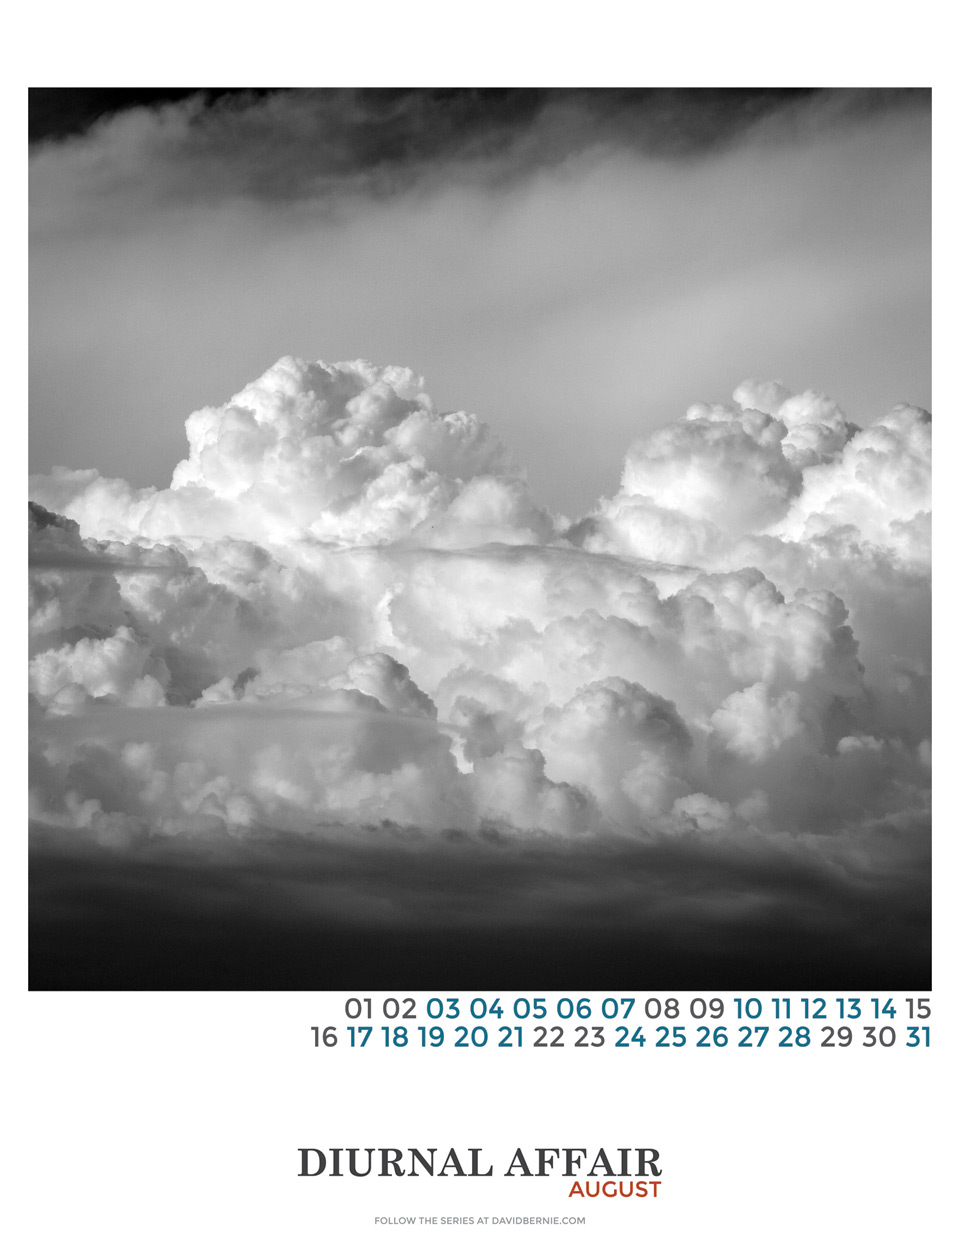 August-Calendar-David-Bernie-2015